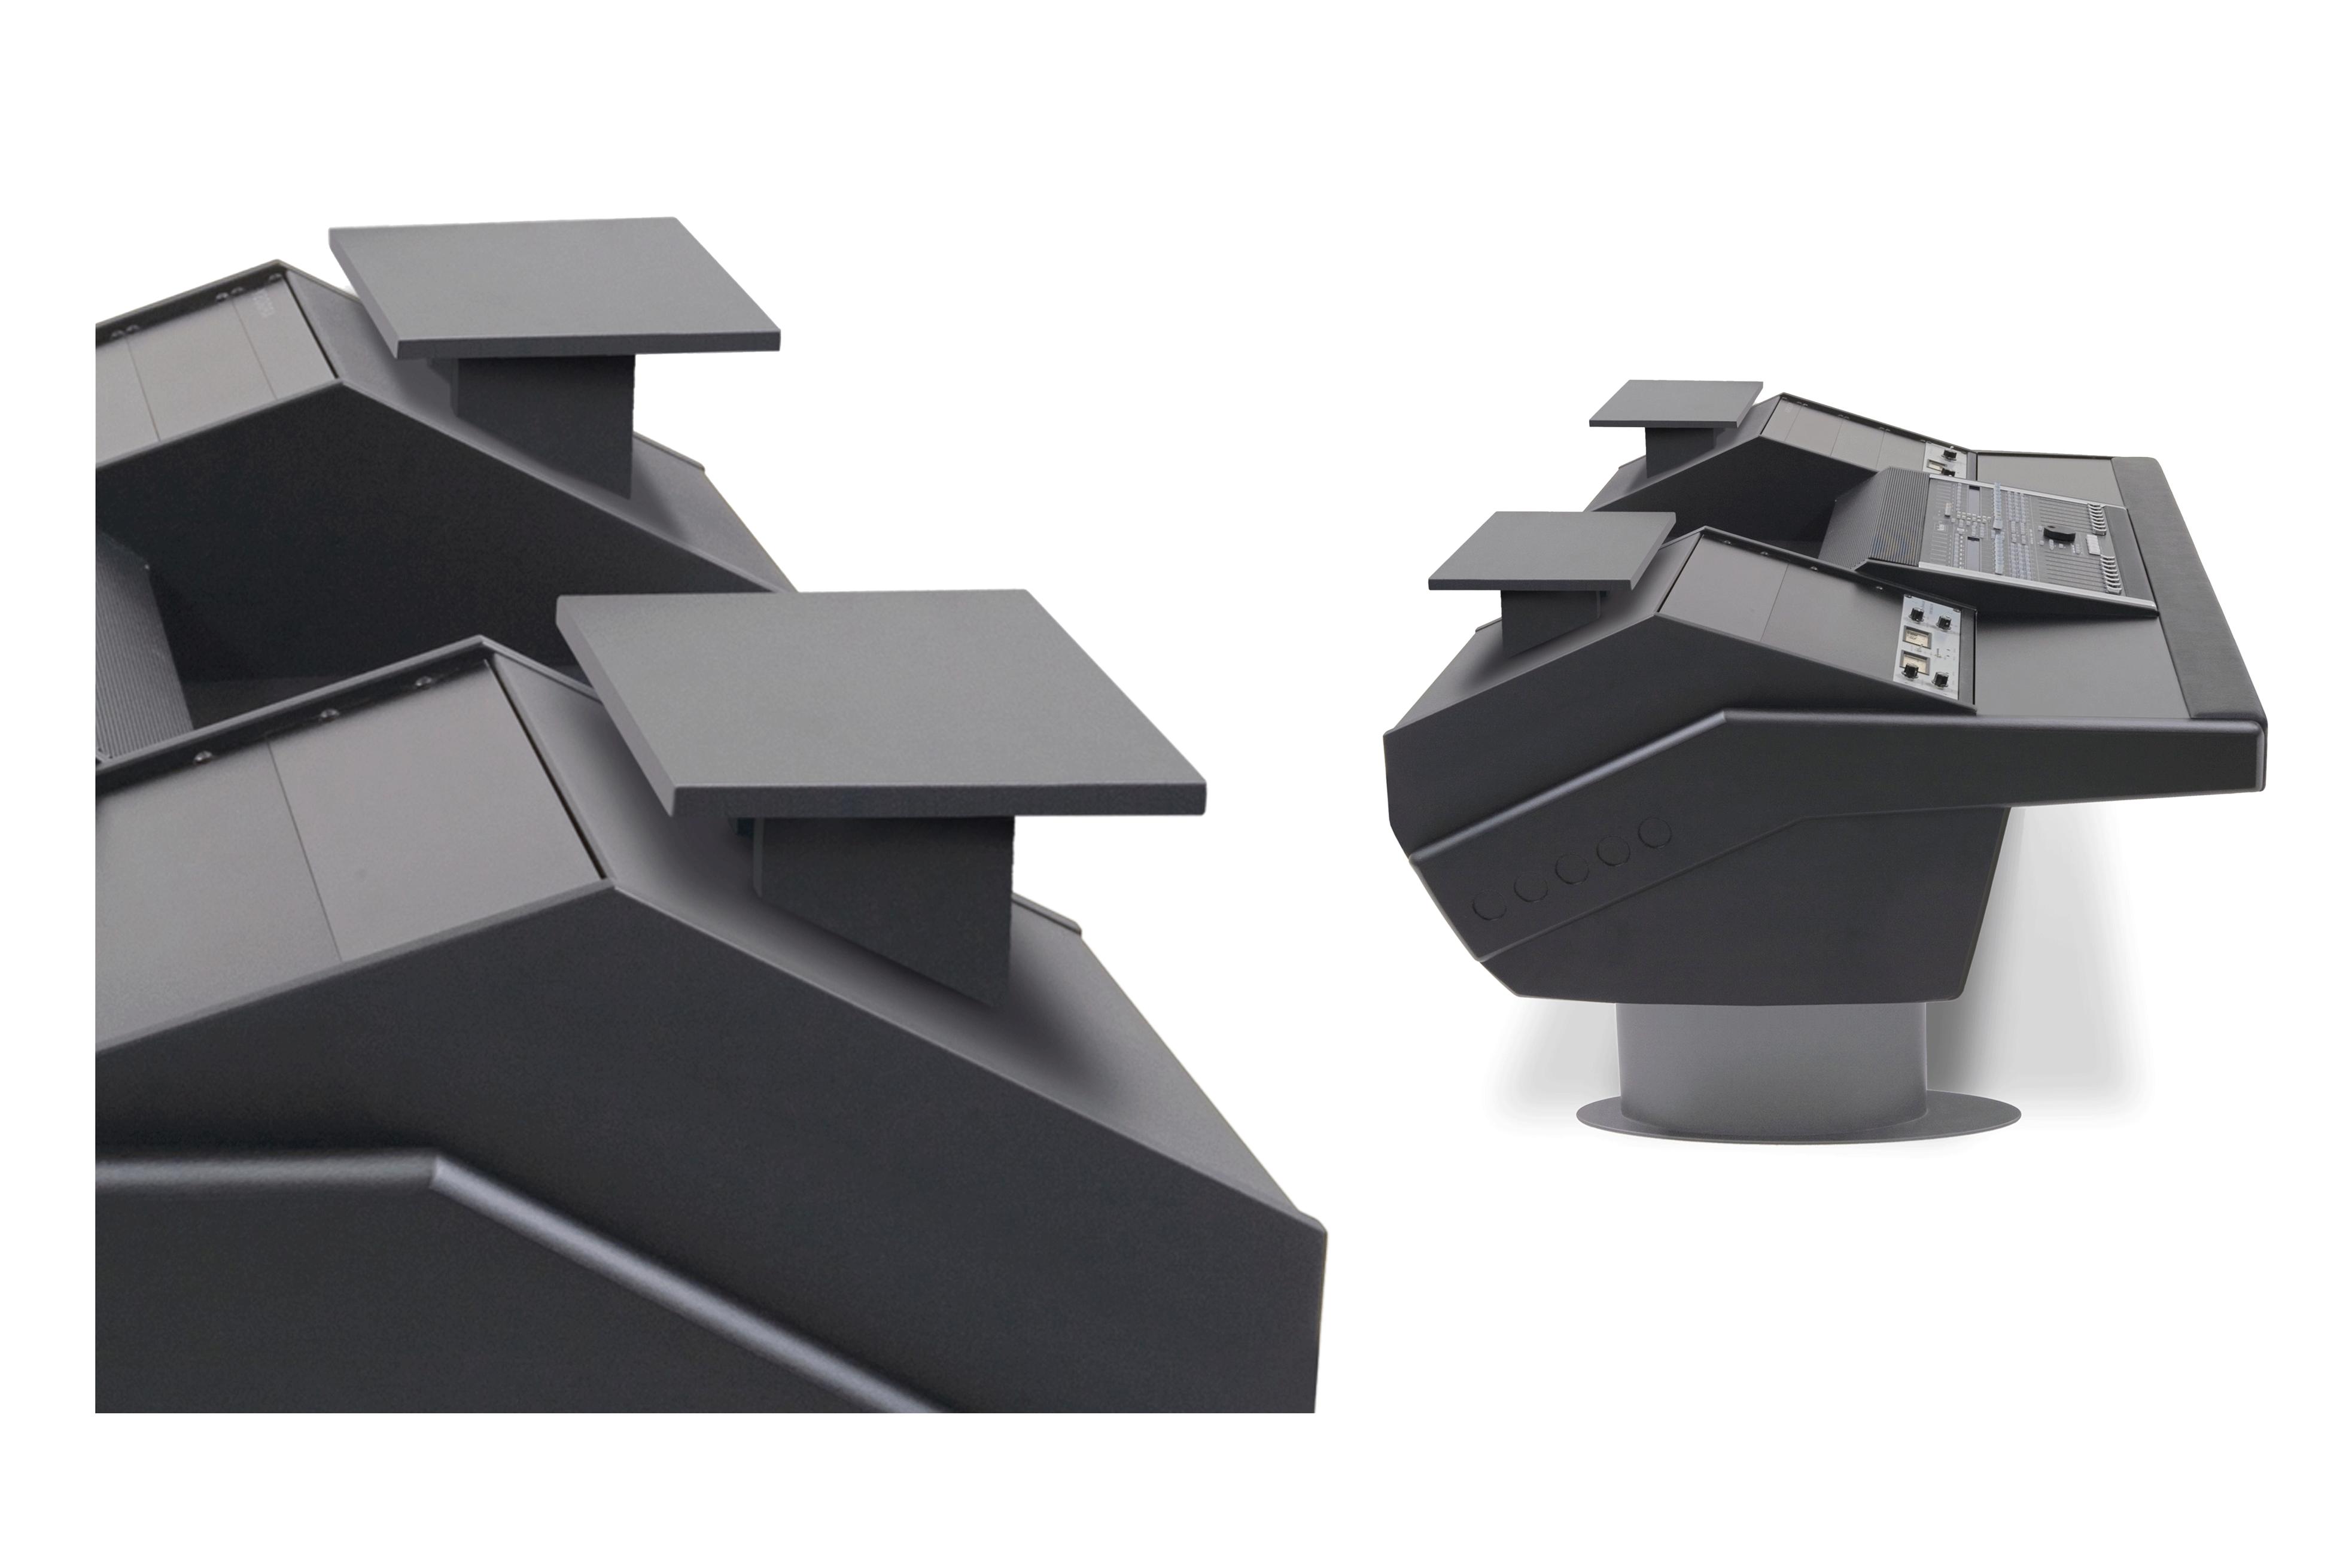 G-series Speaker Platforms